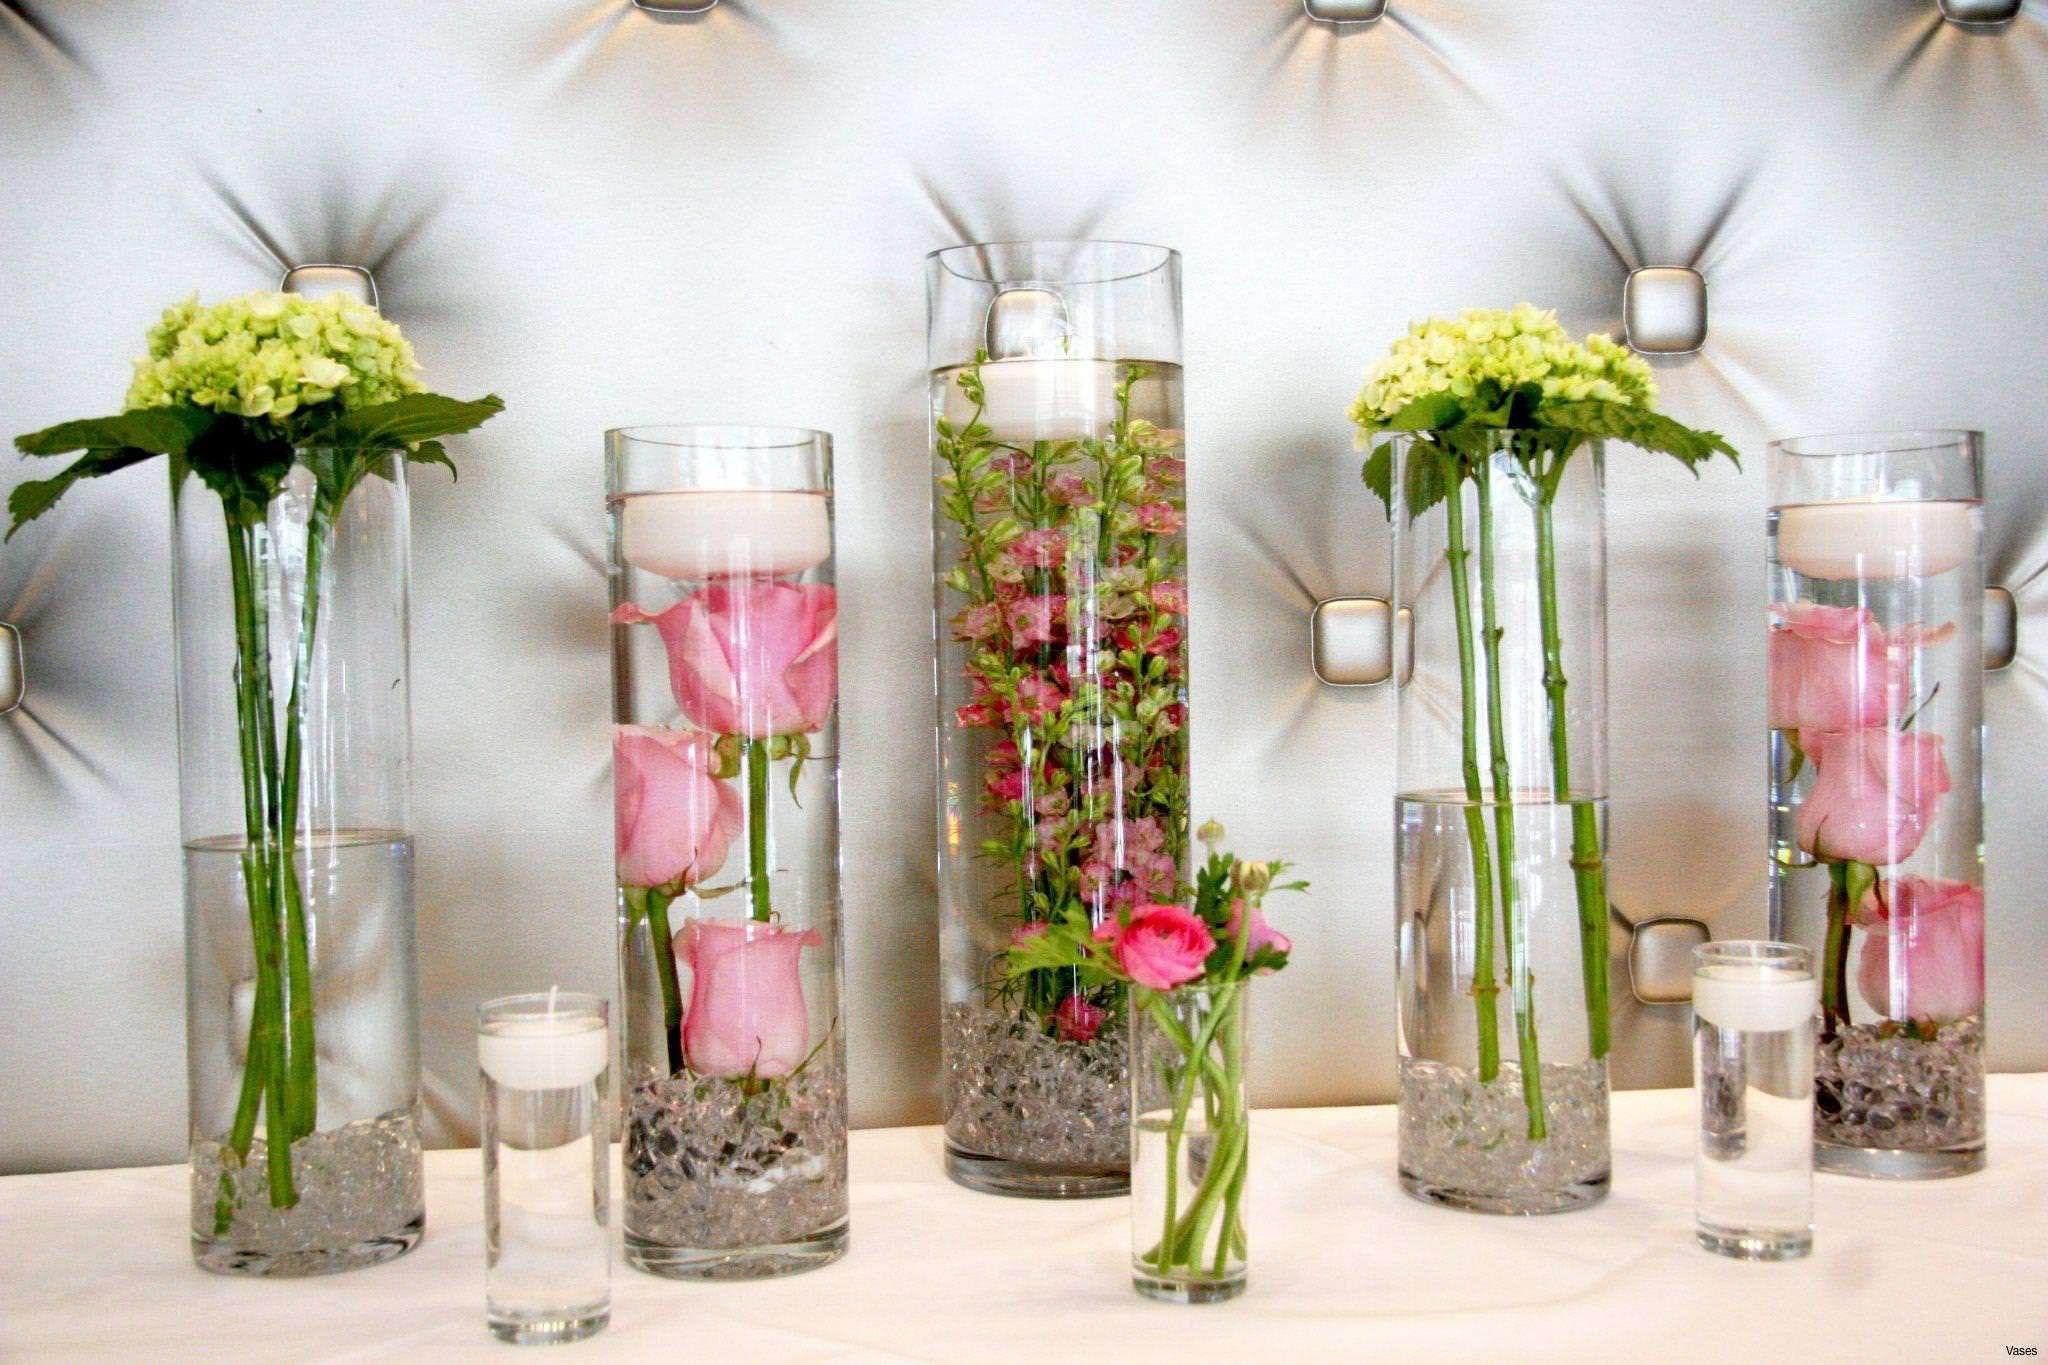 4 foot glass cylinder vases of 24 types of vases for flowers the weekly world regarding 46 inspirational floral arrangement ideas image 35 best floral arrangements design tall vase